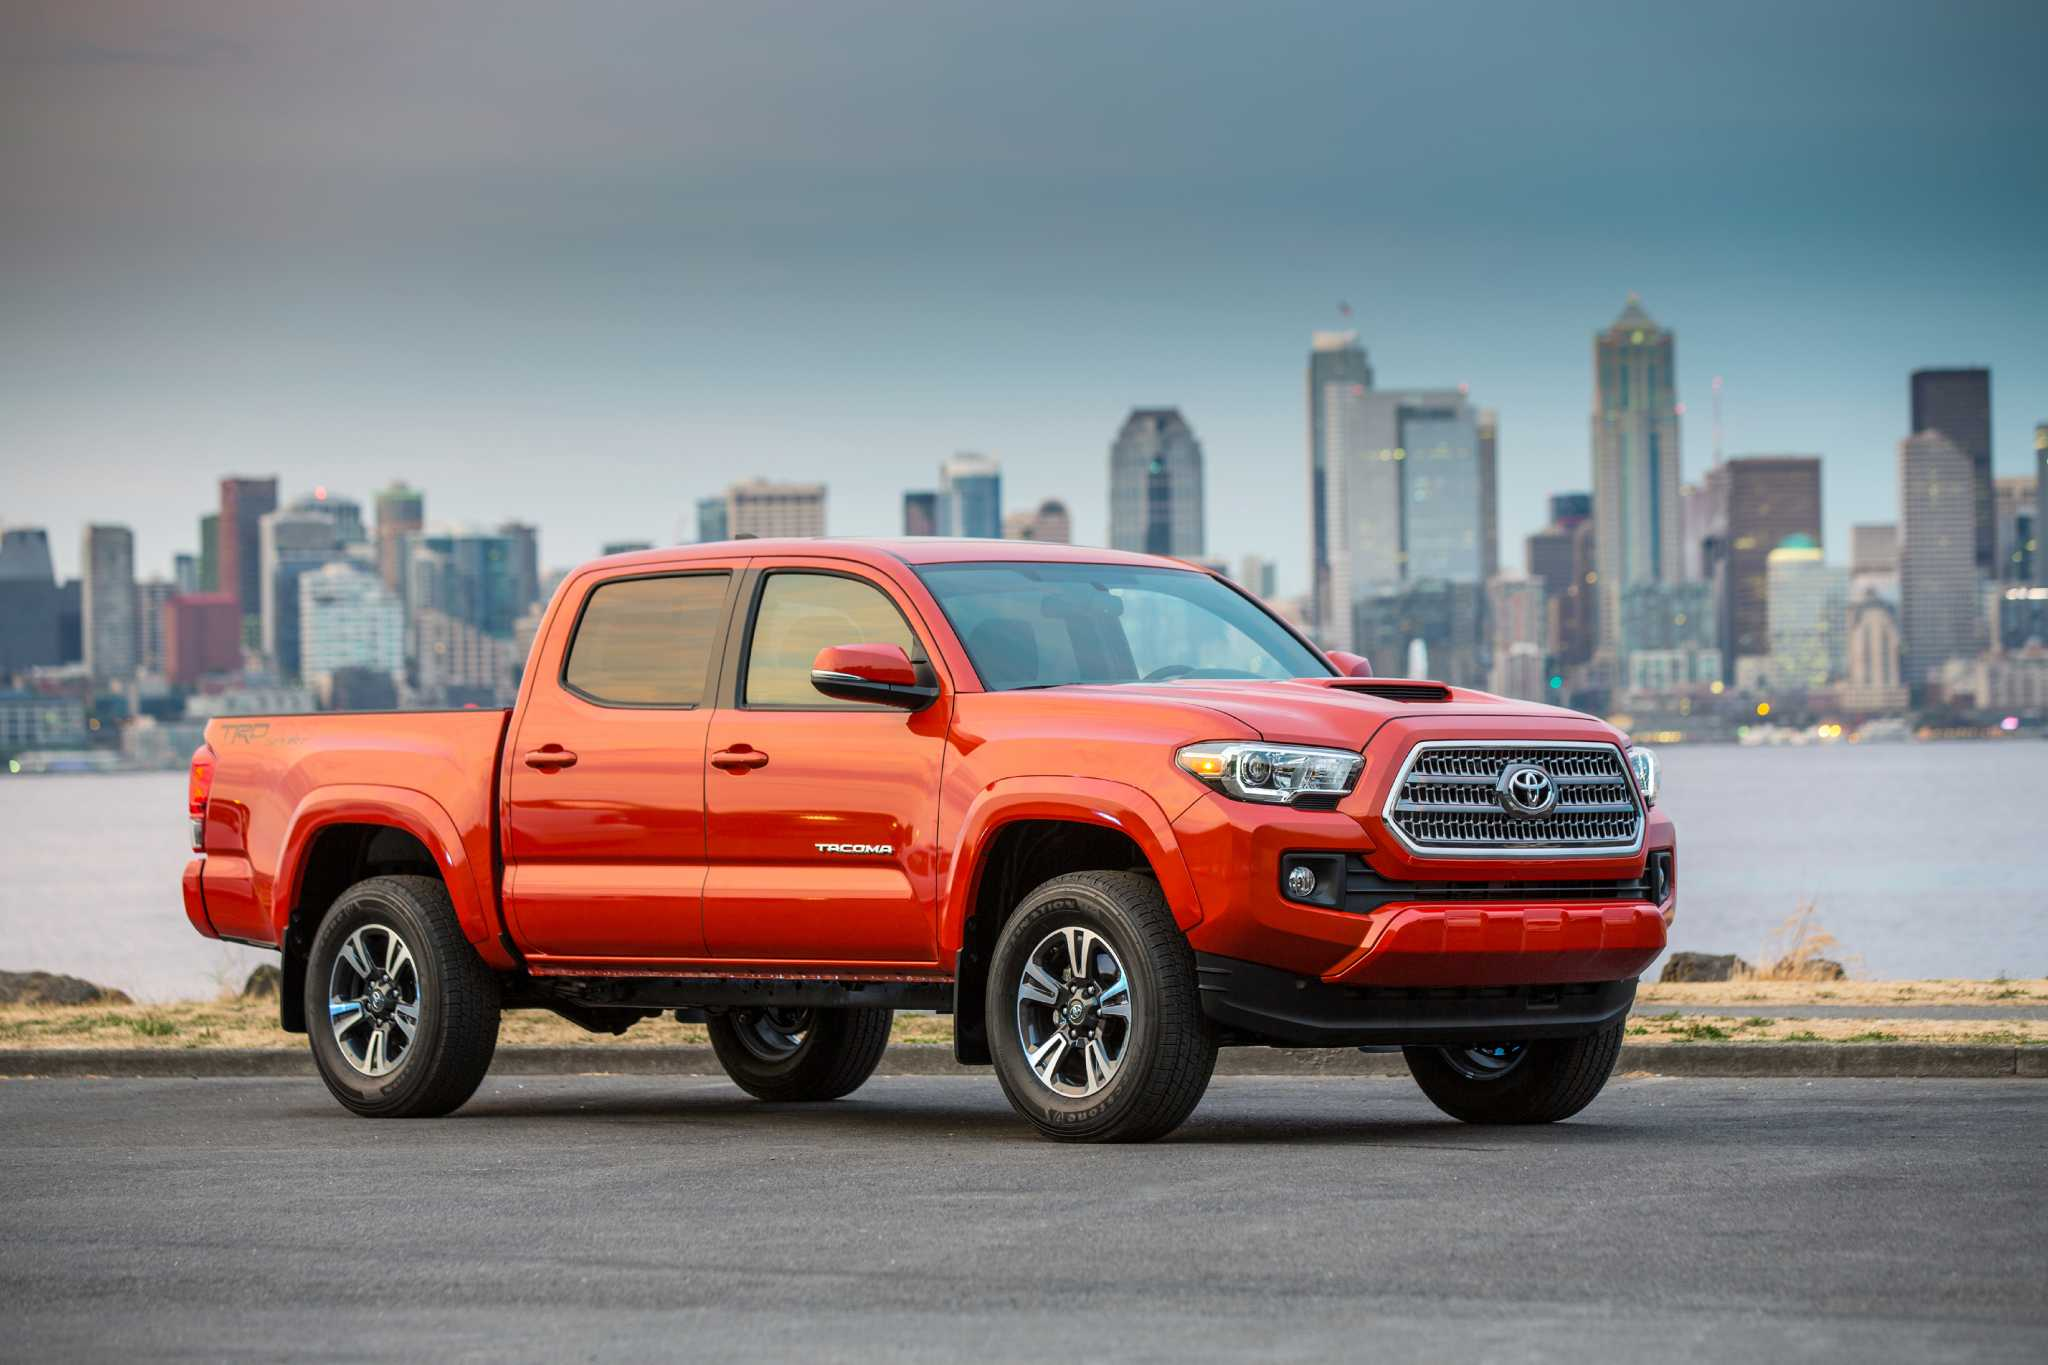 Perennially popular Toyota Tacoma pickup overhauled for 2016